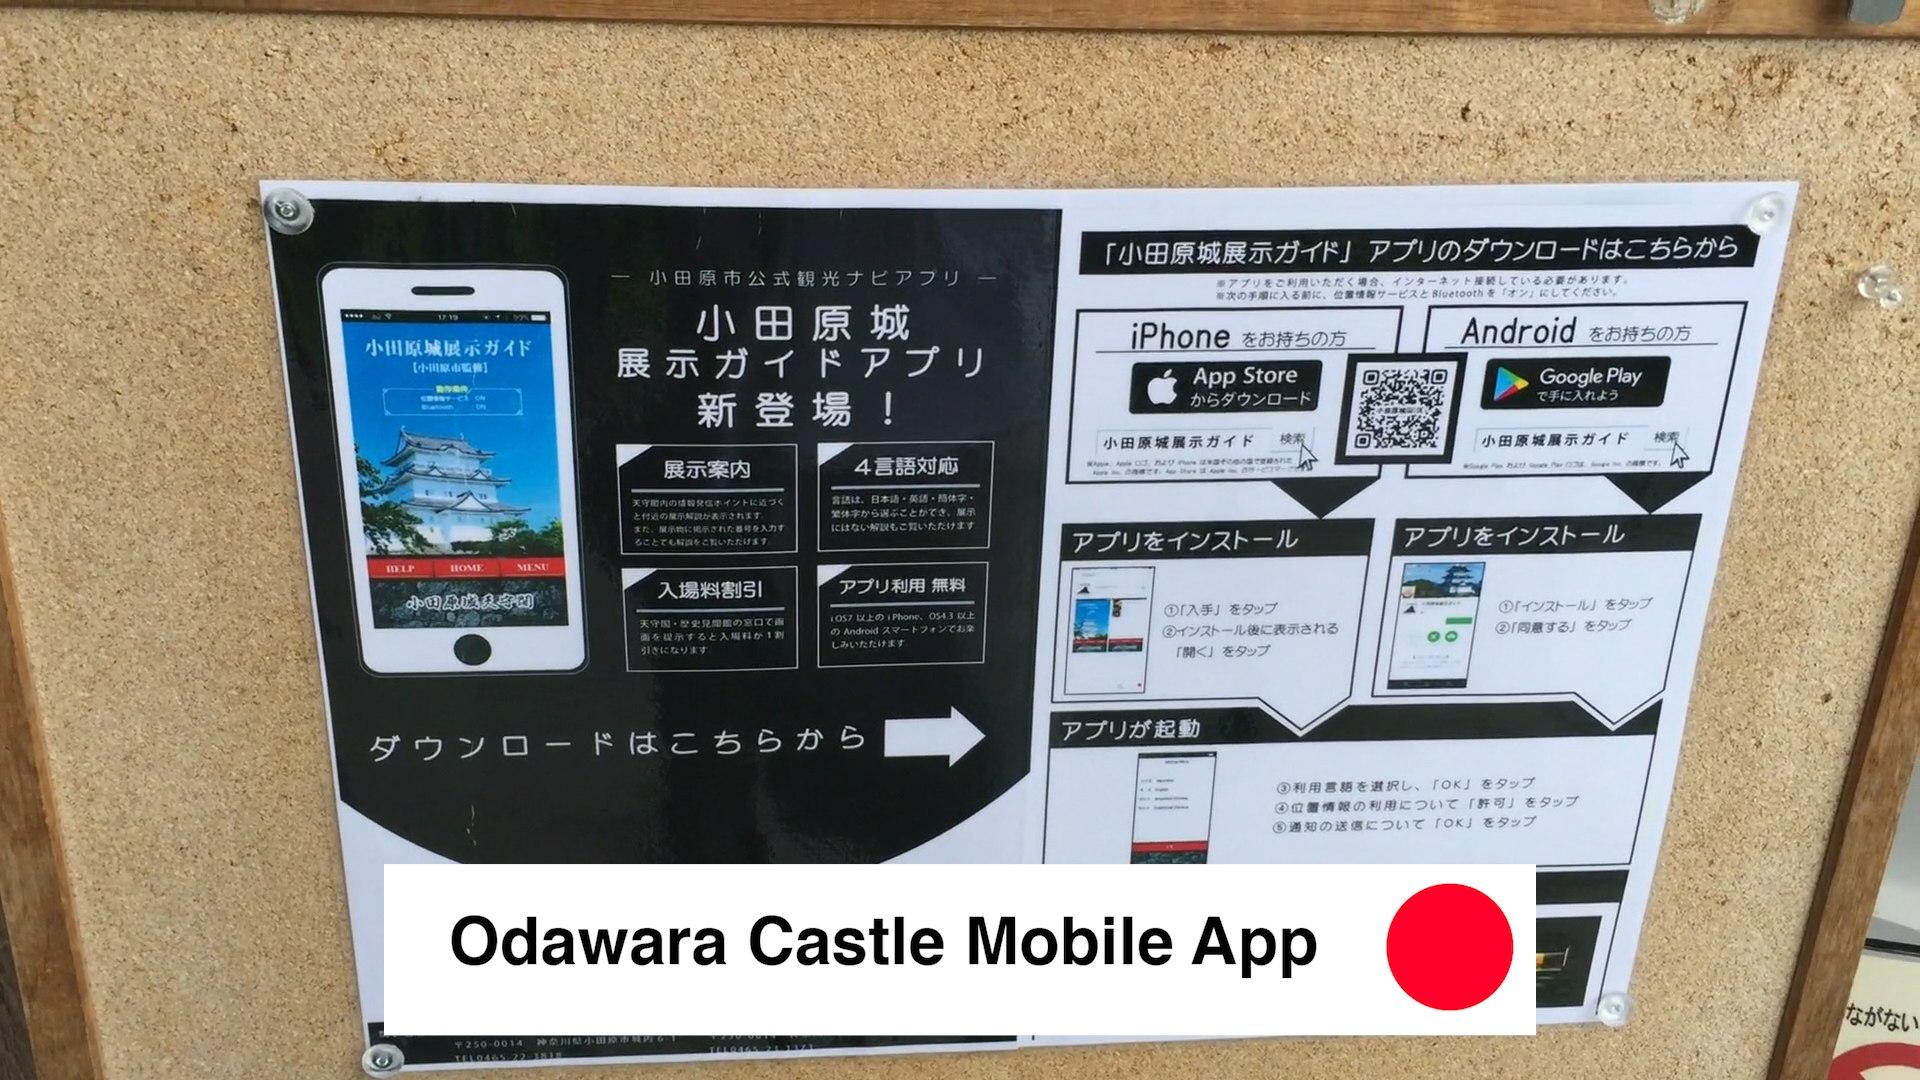 Odawara Castle Mobile App - Odawara Castle Japan Guide Review Video - 9 Reasons To See Odawara Castle Kanagawa Japan 🇯🇵 🏯 🌸